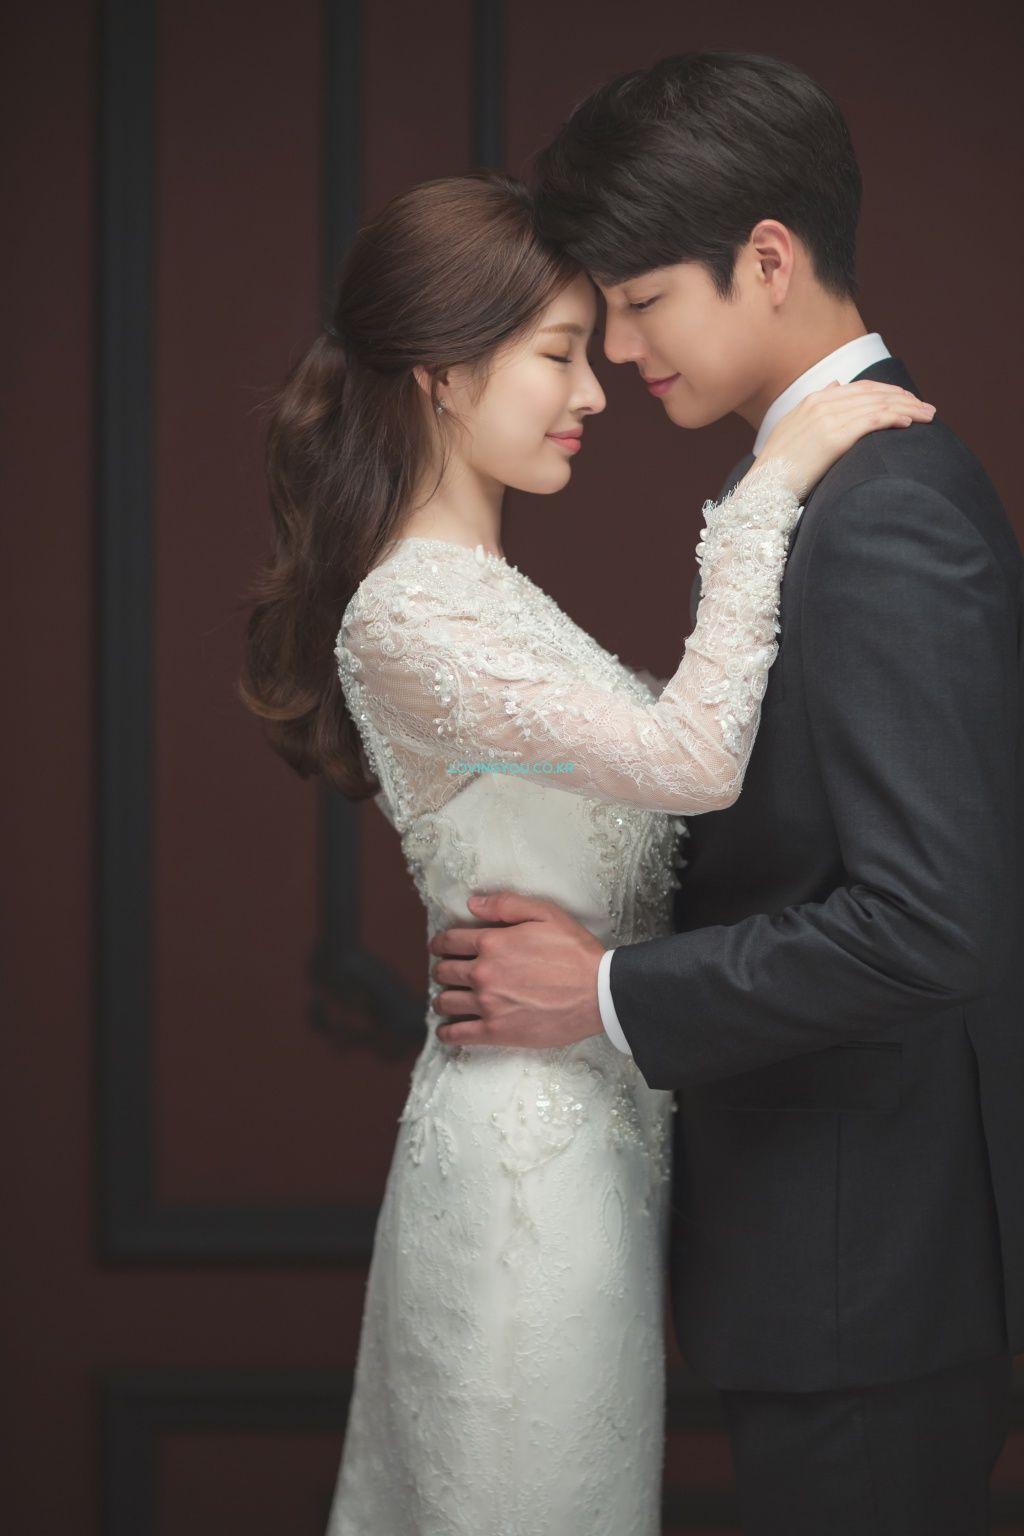 Piona Maida Vale Korea Pre Wedding Photoshoot By Lovingyou Wedding Photo Studio Korean Wedding Photography Wedding Photoshoot